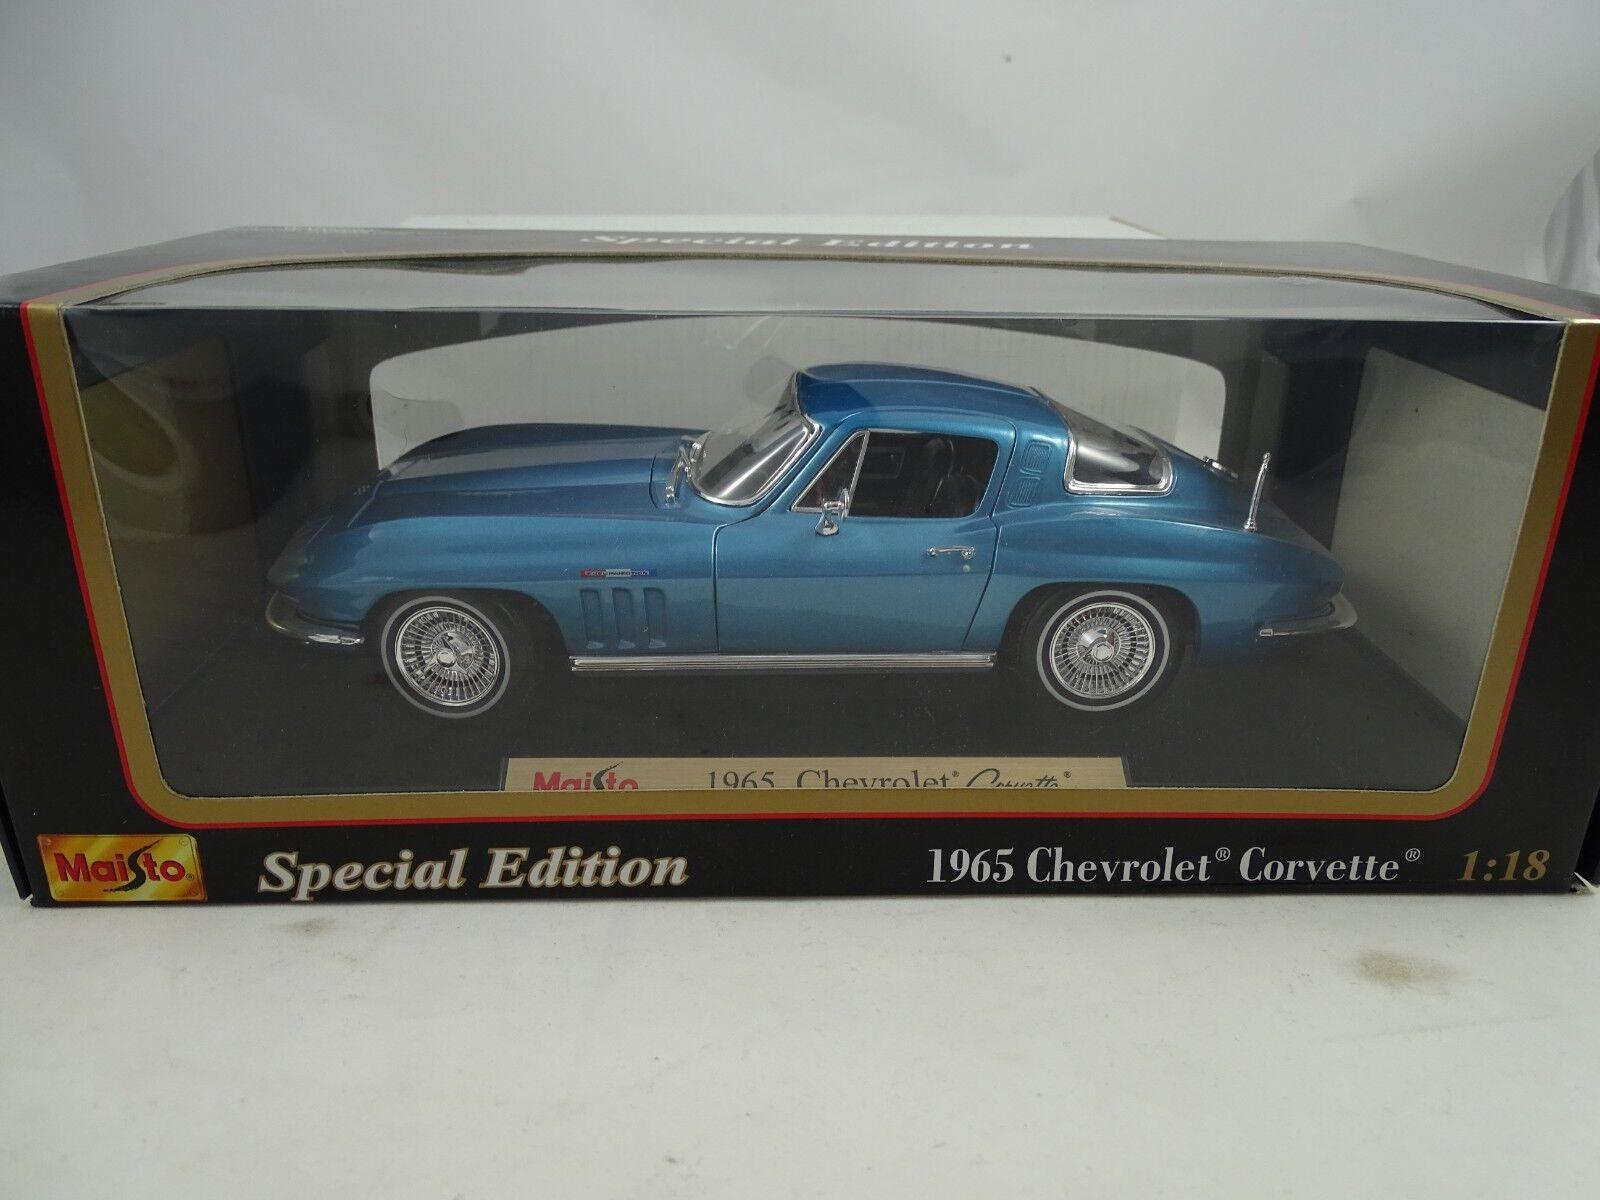 1 18 Maisto Special Edition  31640 - 1965 Chevrolet Corvette Blaumetal  RARITÄT   | Grüne, neue Technologie